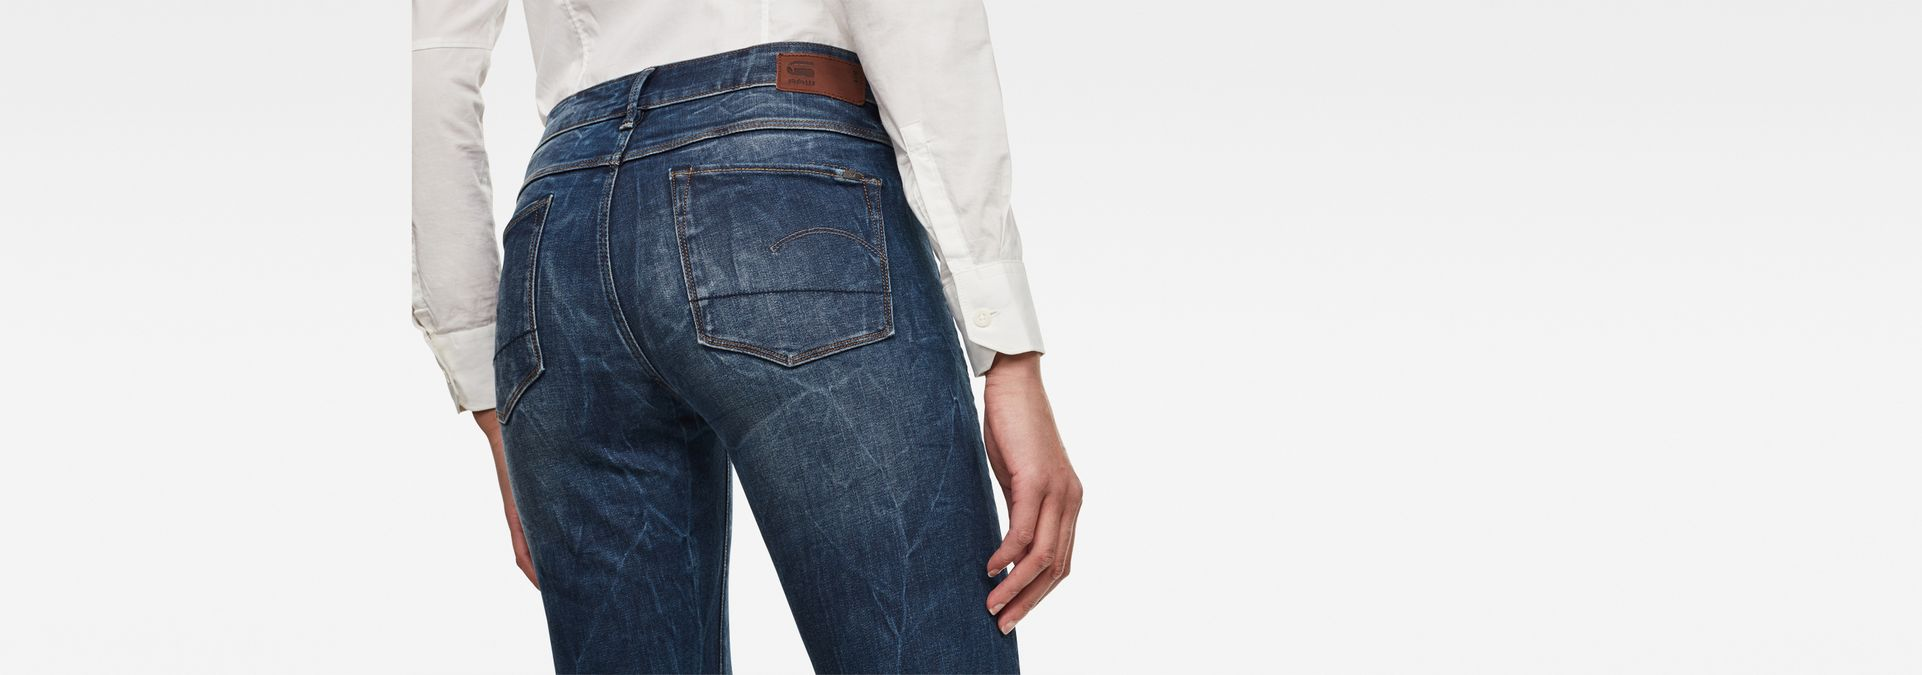 g star jeans damen sale star jeans damen midge cody. Black Bedroom Furniture Sets. Home Design Ideas